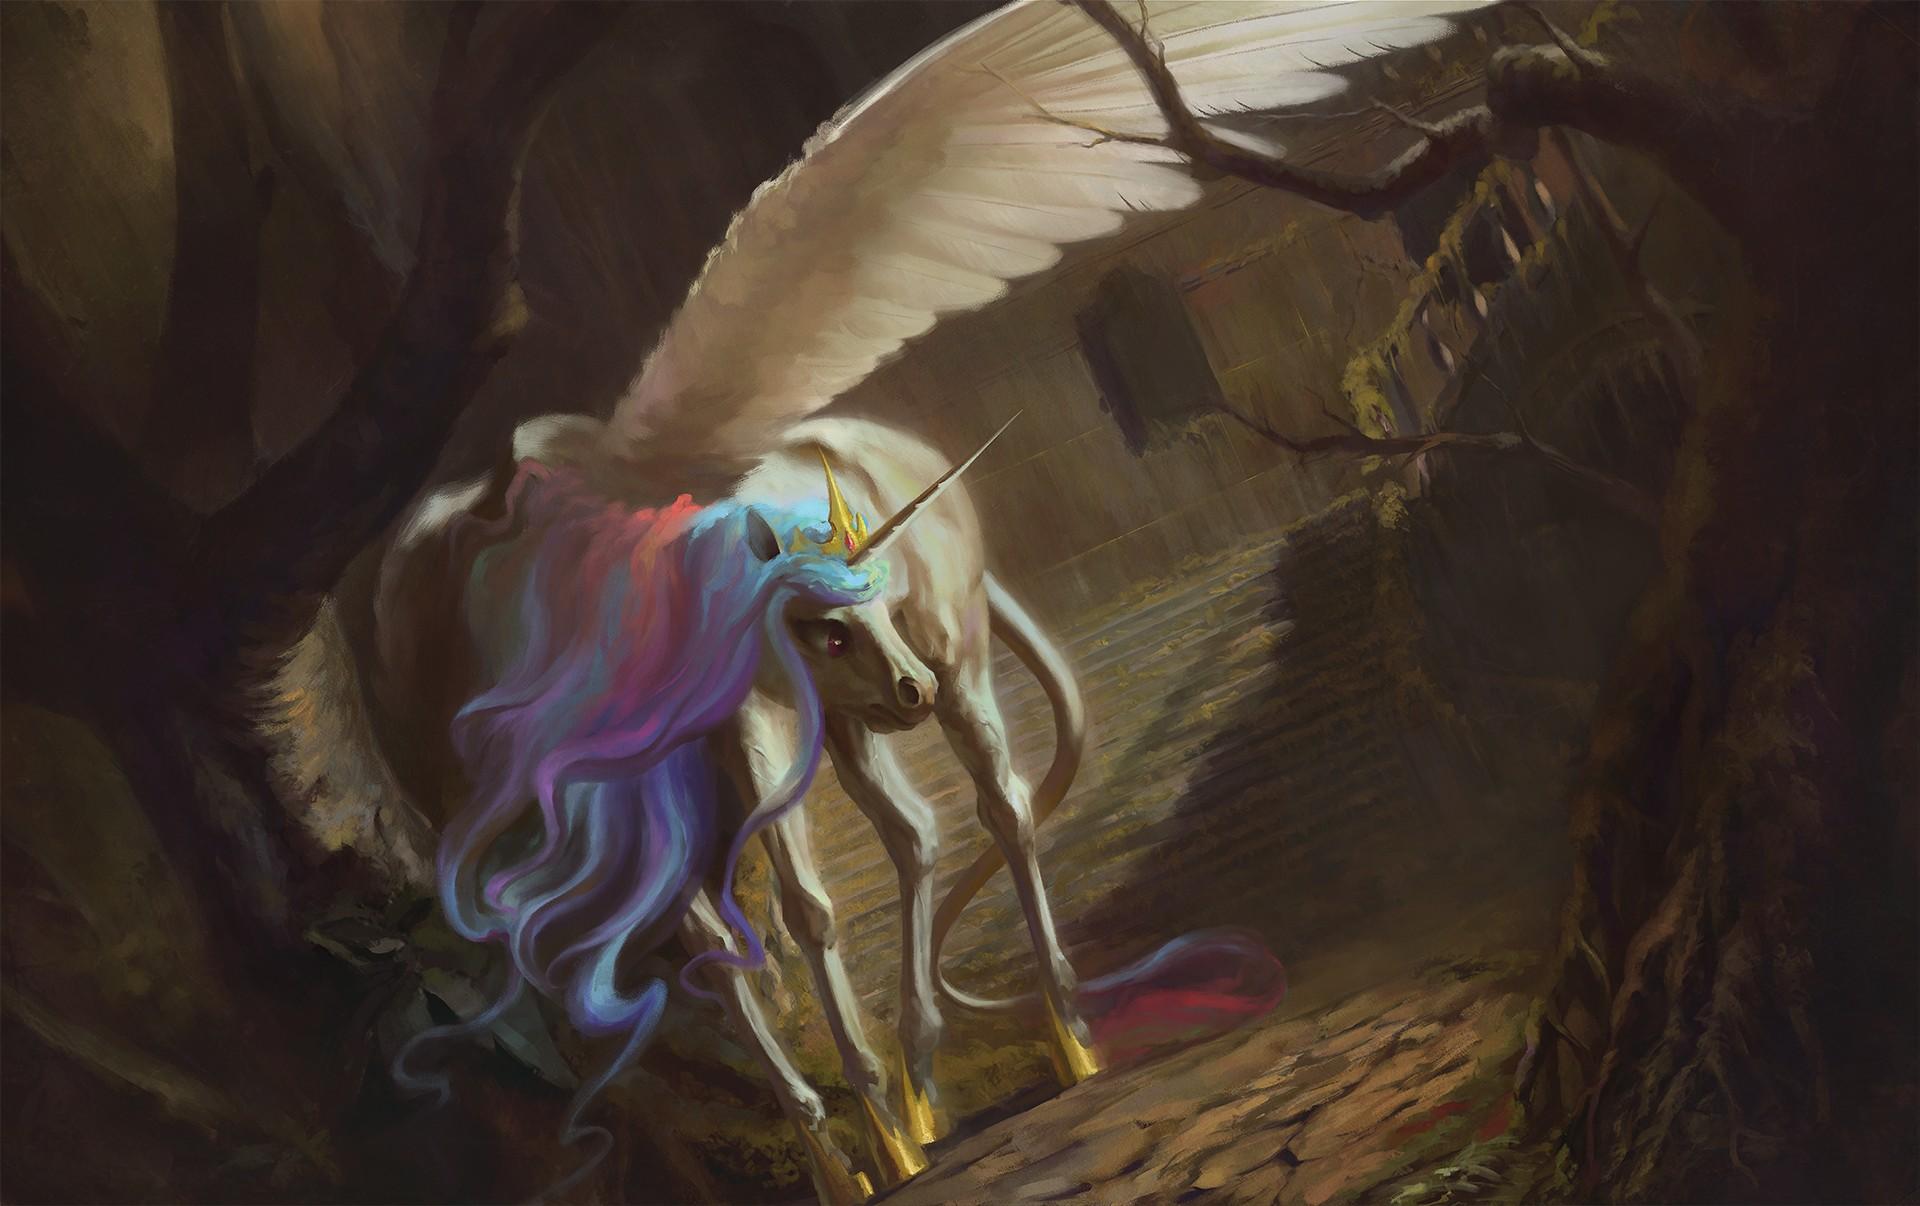 hinh nen ky lan unicorn 19